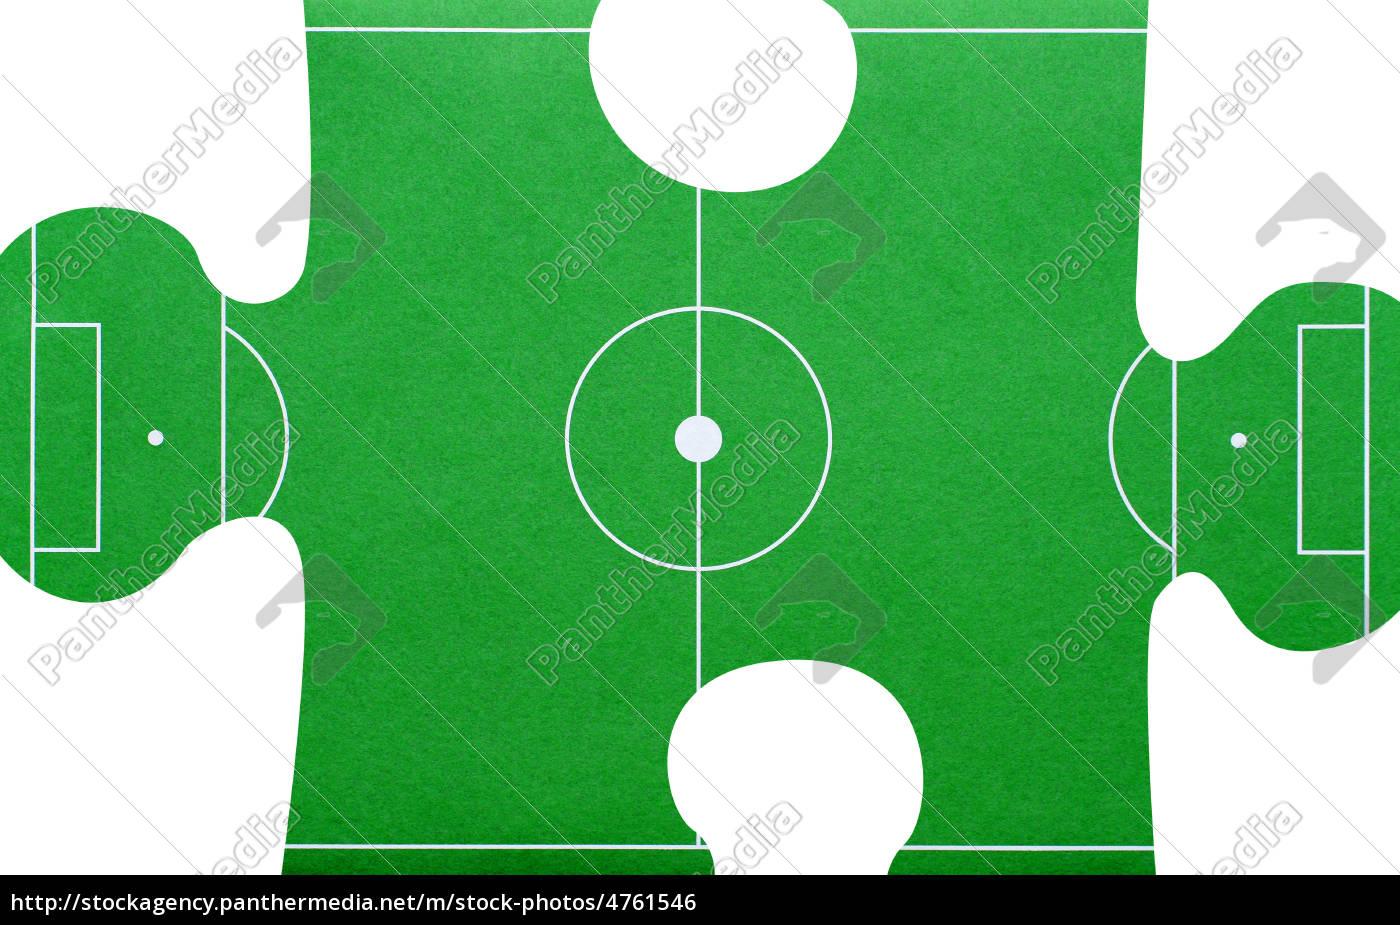 Stockfoto 4761546 Football Soccer Fussball Puzzle